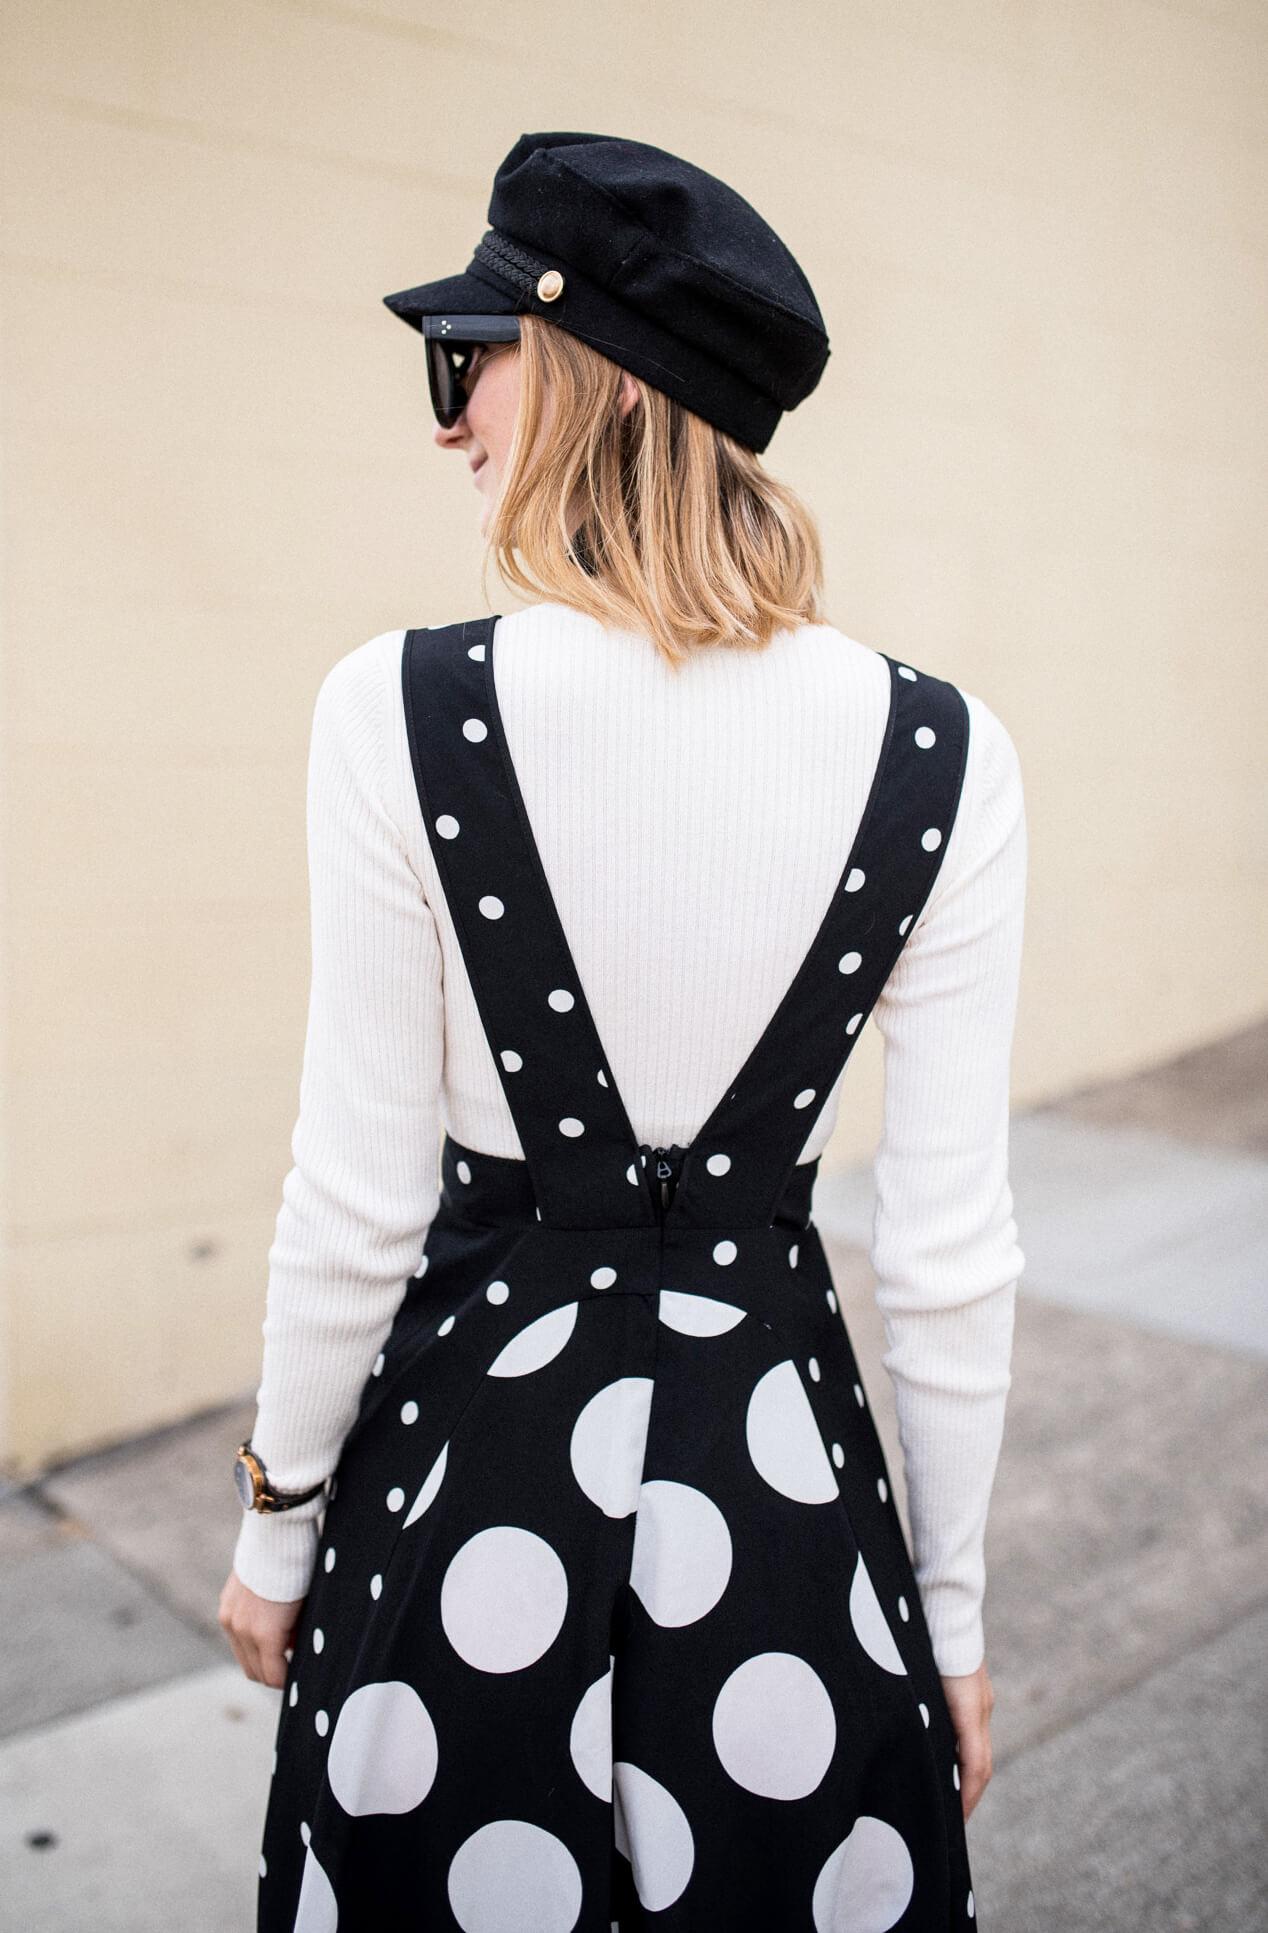 Black-White-PolkaDot-Look.jpg